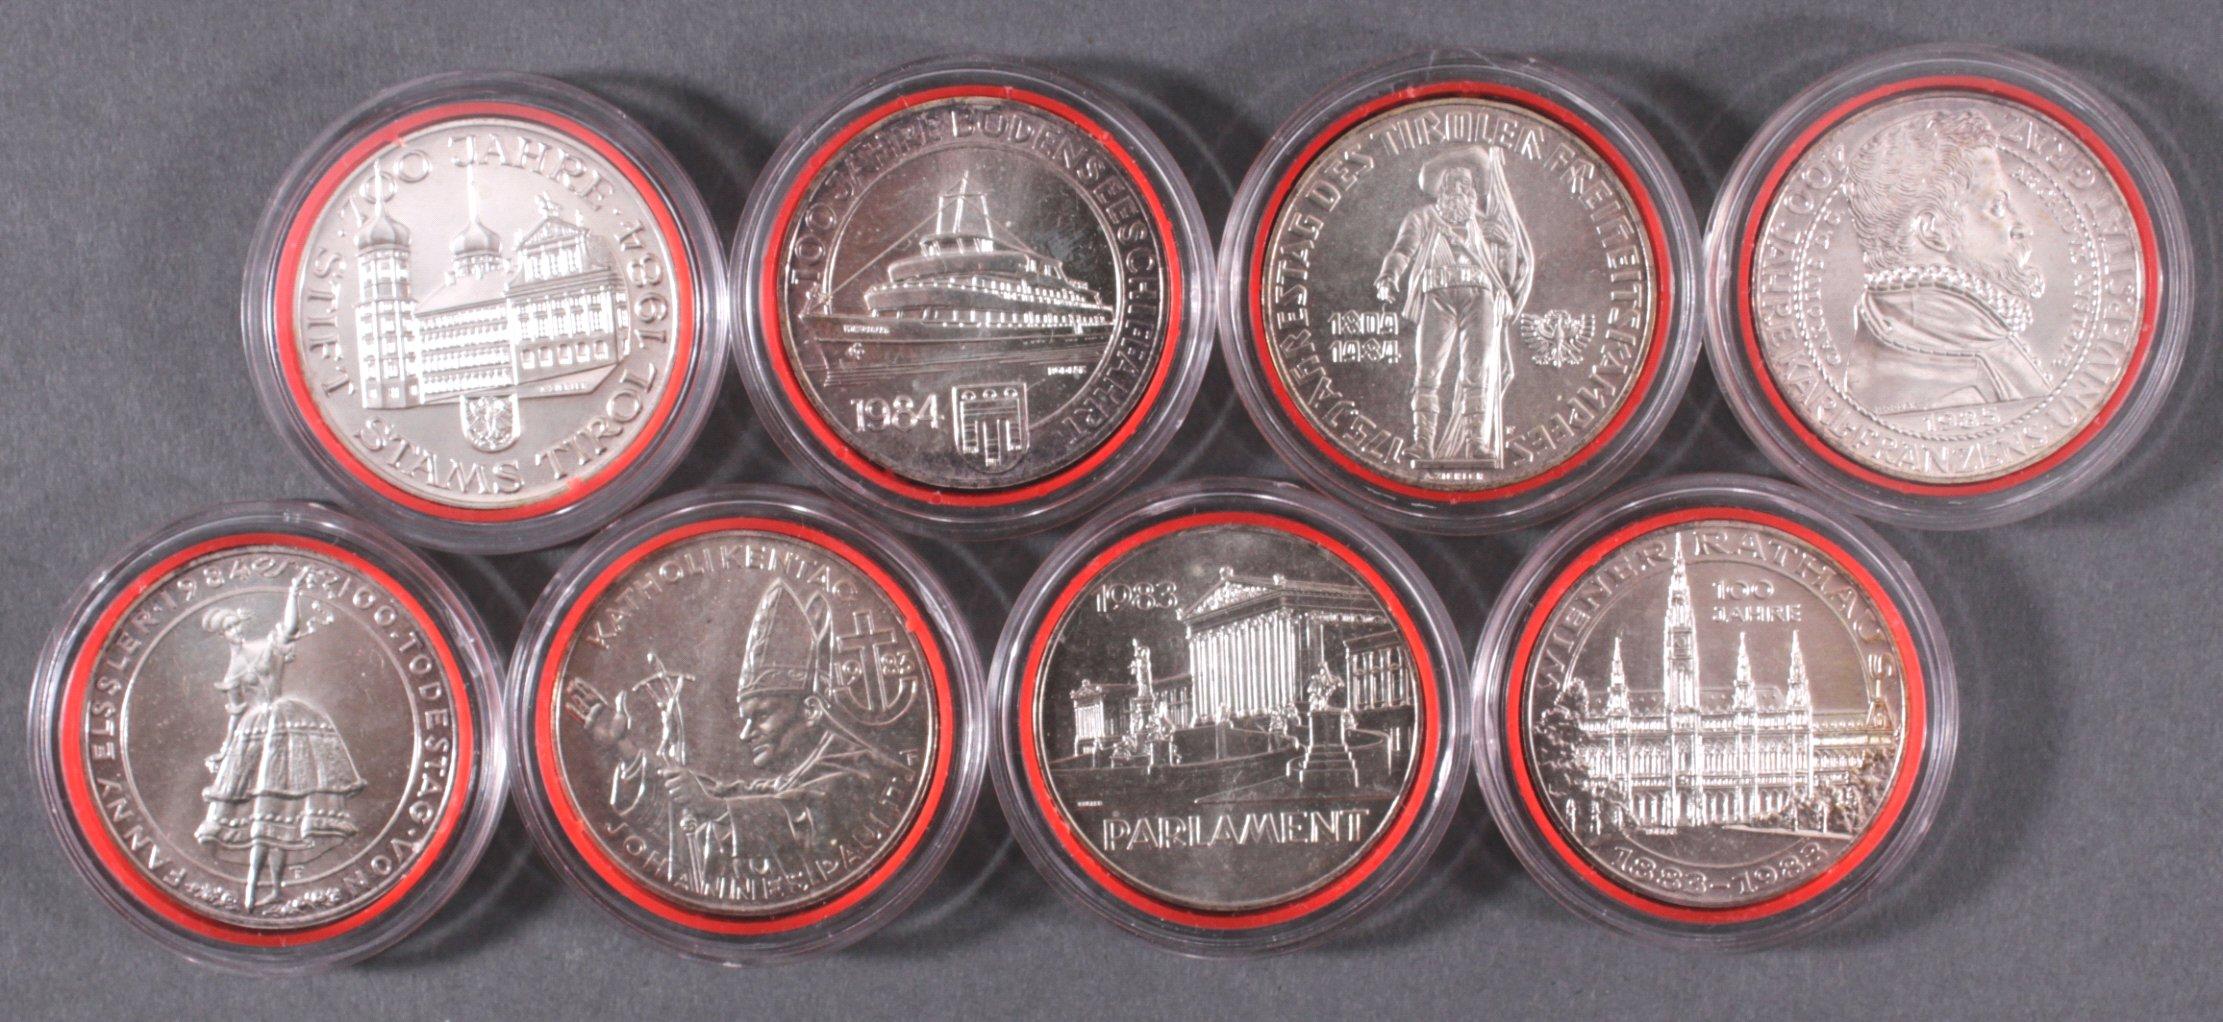 8x 500 Schilling Münzen